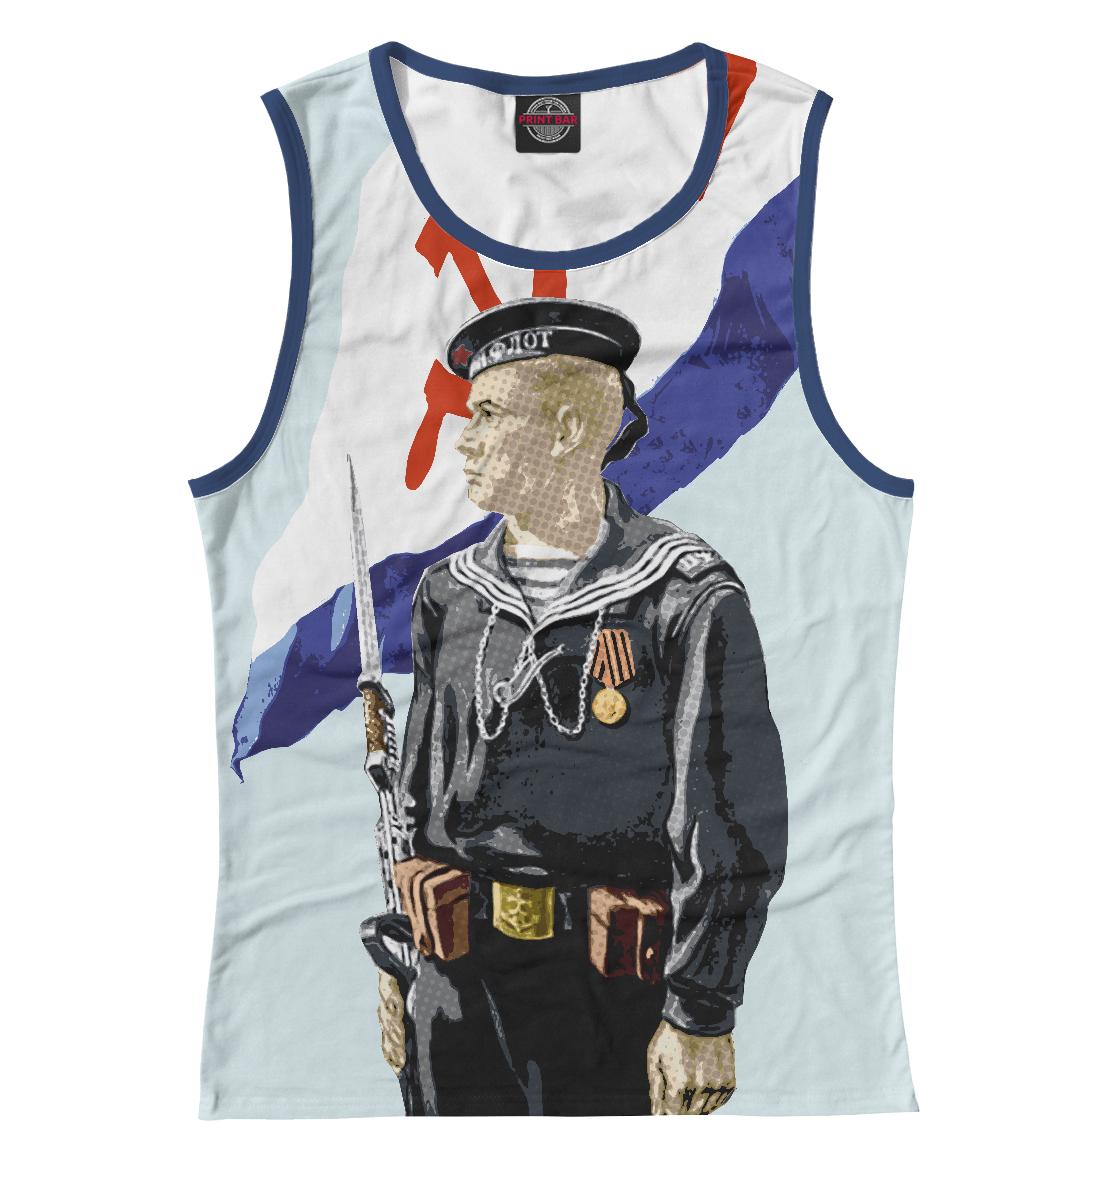 Купить ВМФ - Рулит!, Printbar, Майки, VMF-377186-may-1